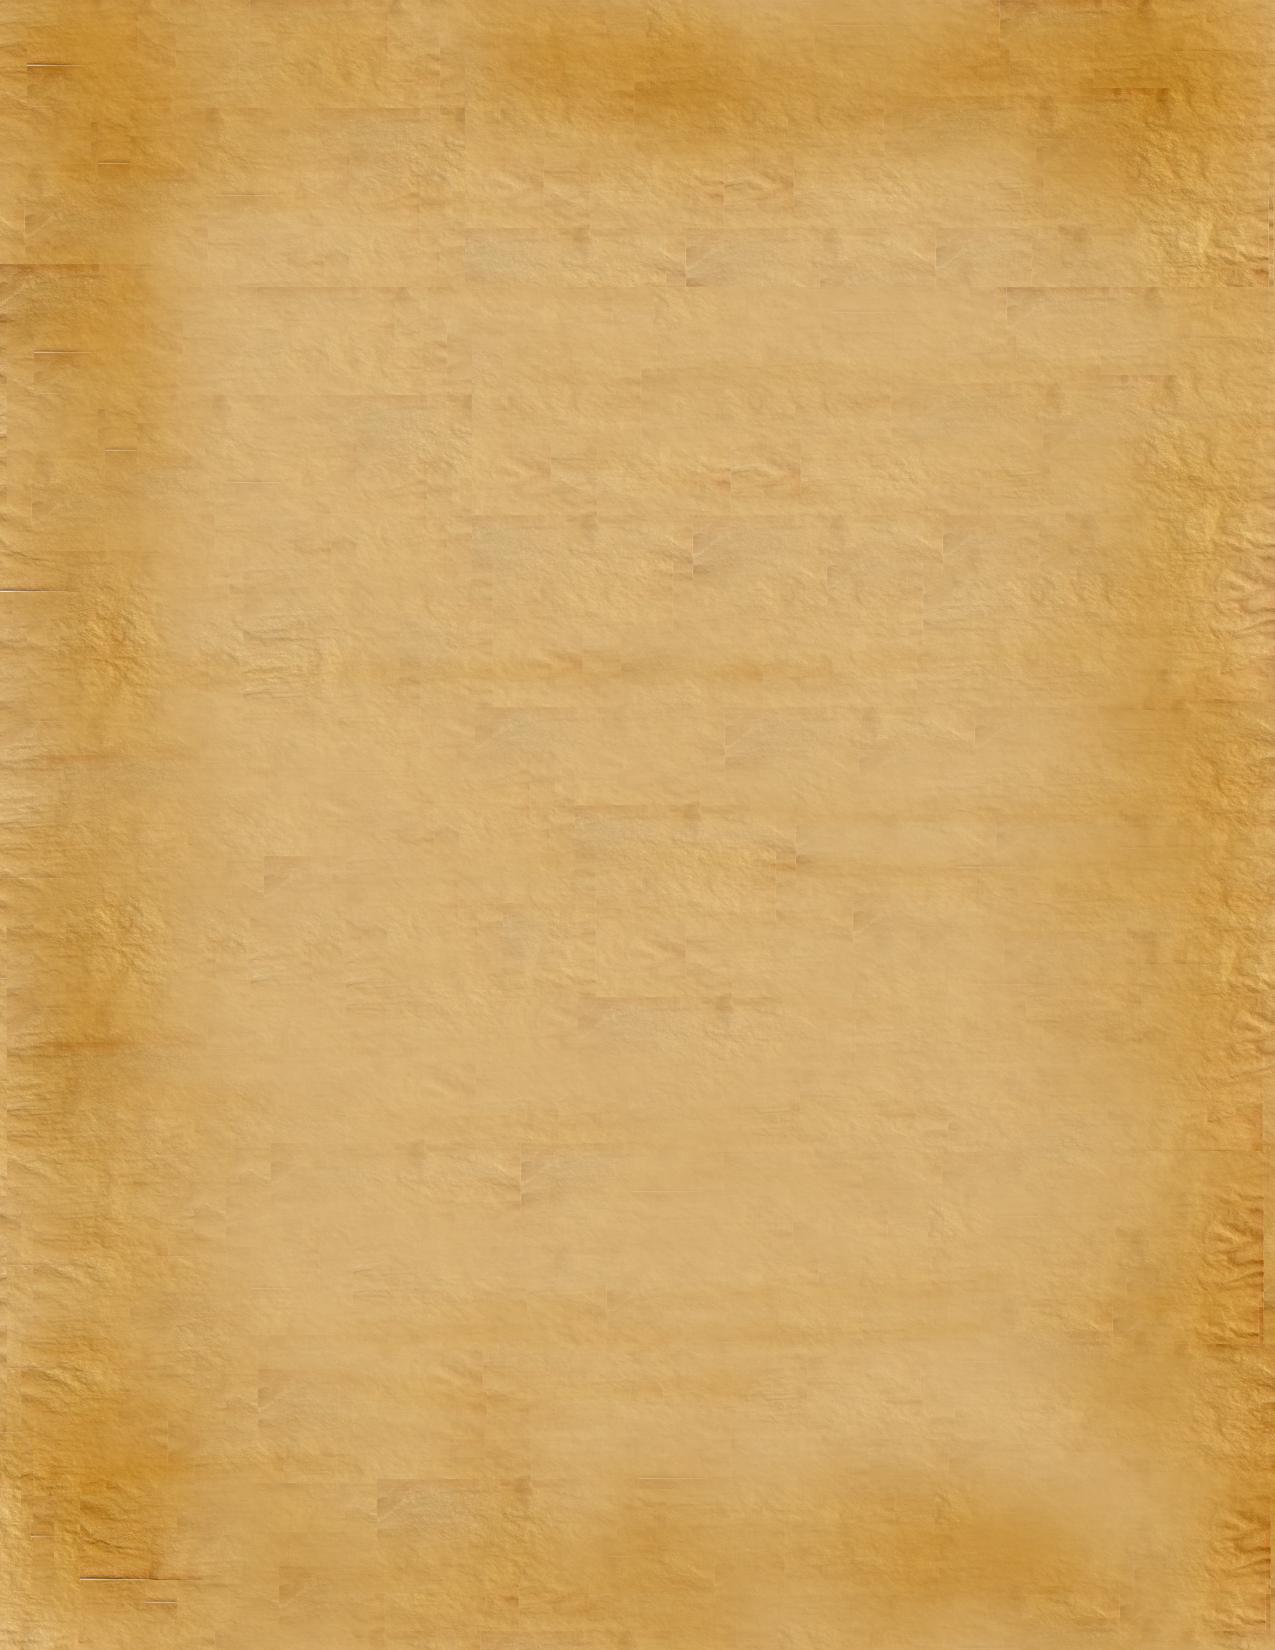 Fabulous Parchment Paper Texture by sinnedaria on DeviantArt KZ78